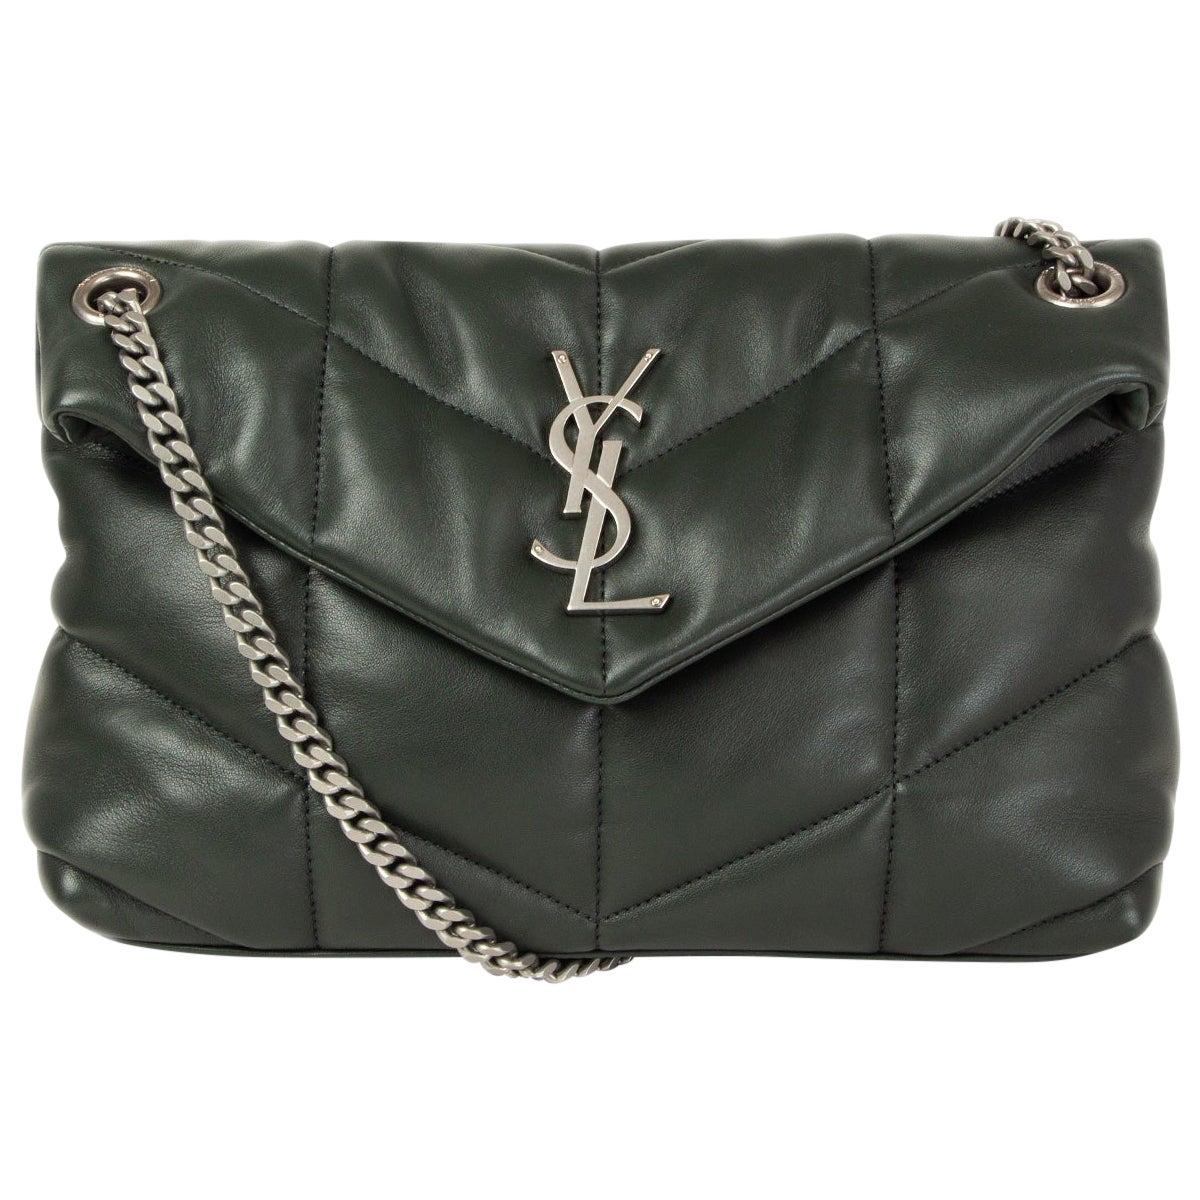 SAINT LAURENT forest green leather SMALL PUFFER Shoulder Bag